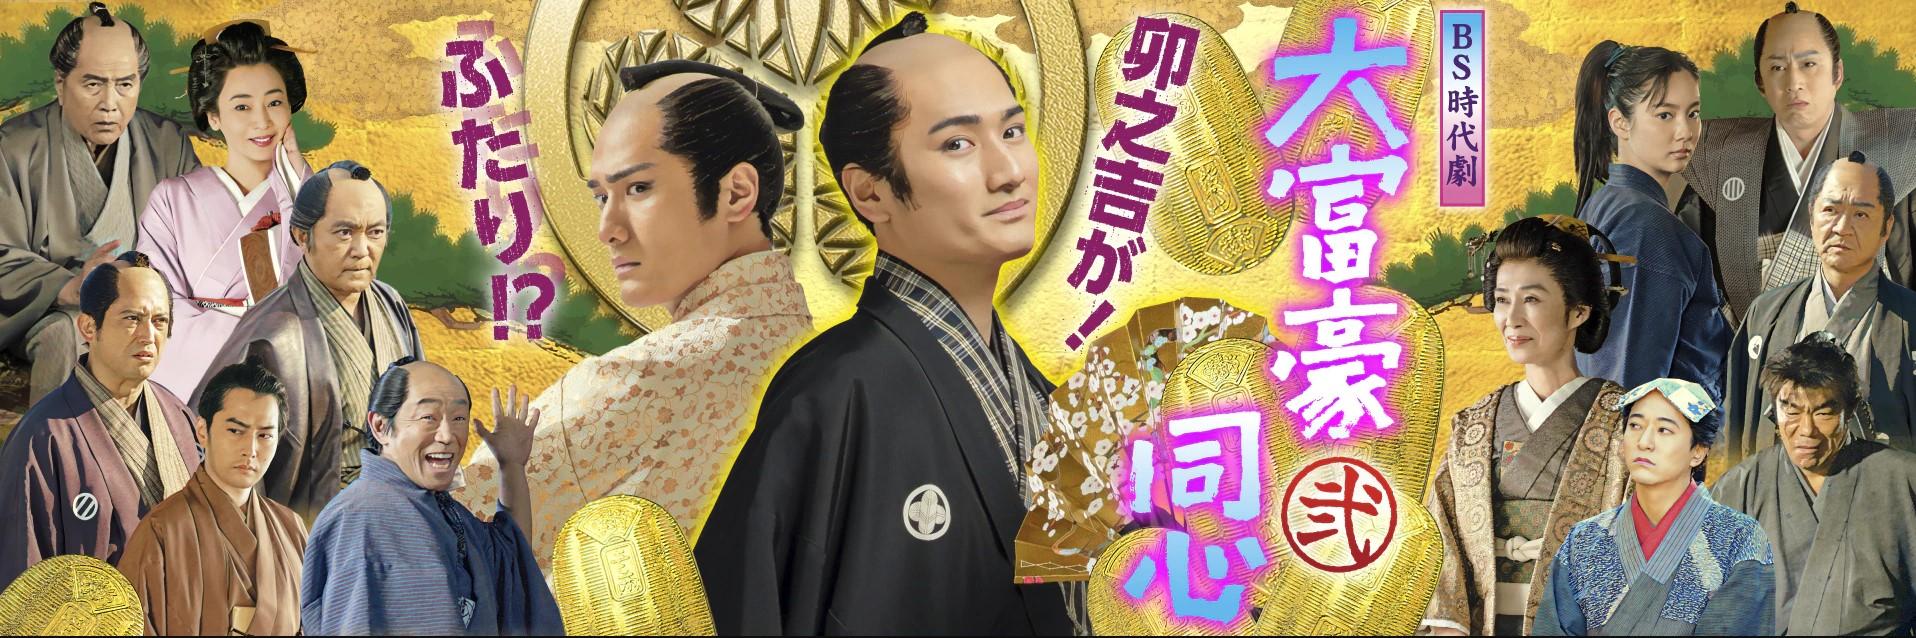 Daifugou Doushin 2 Sinopsis Japanese Drama 2021